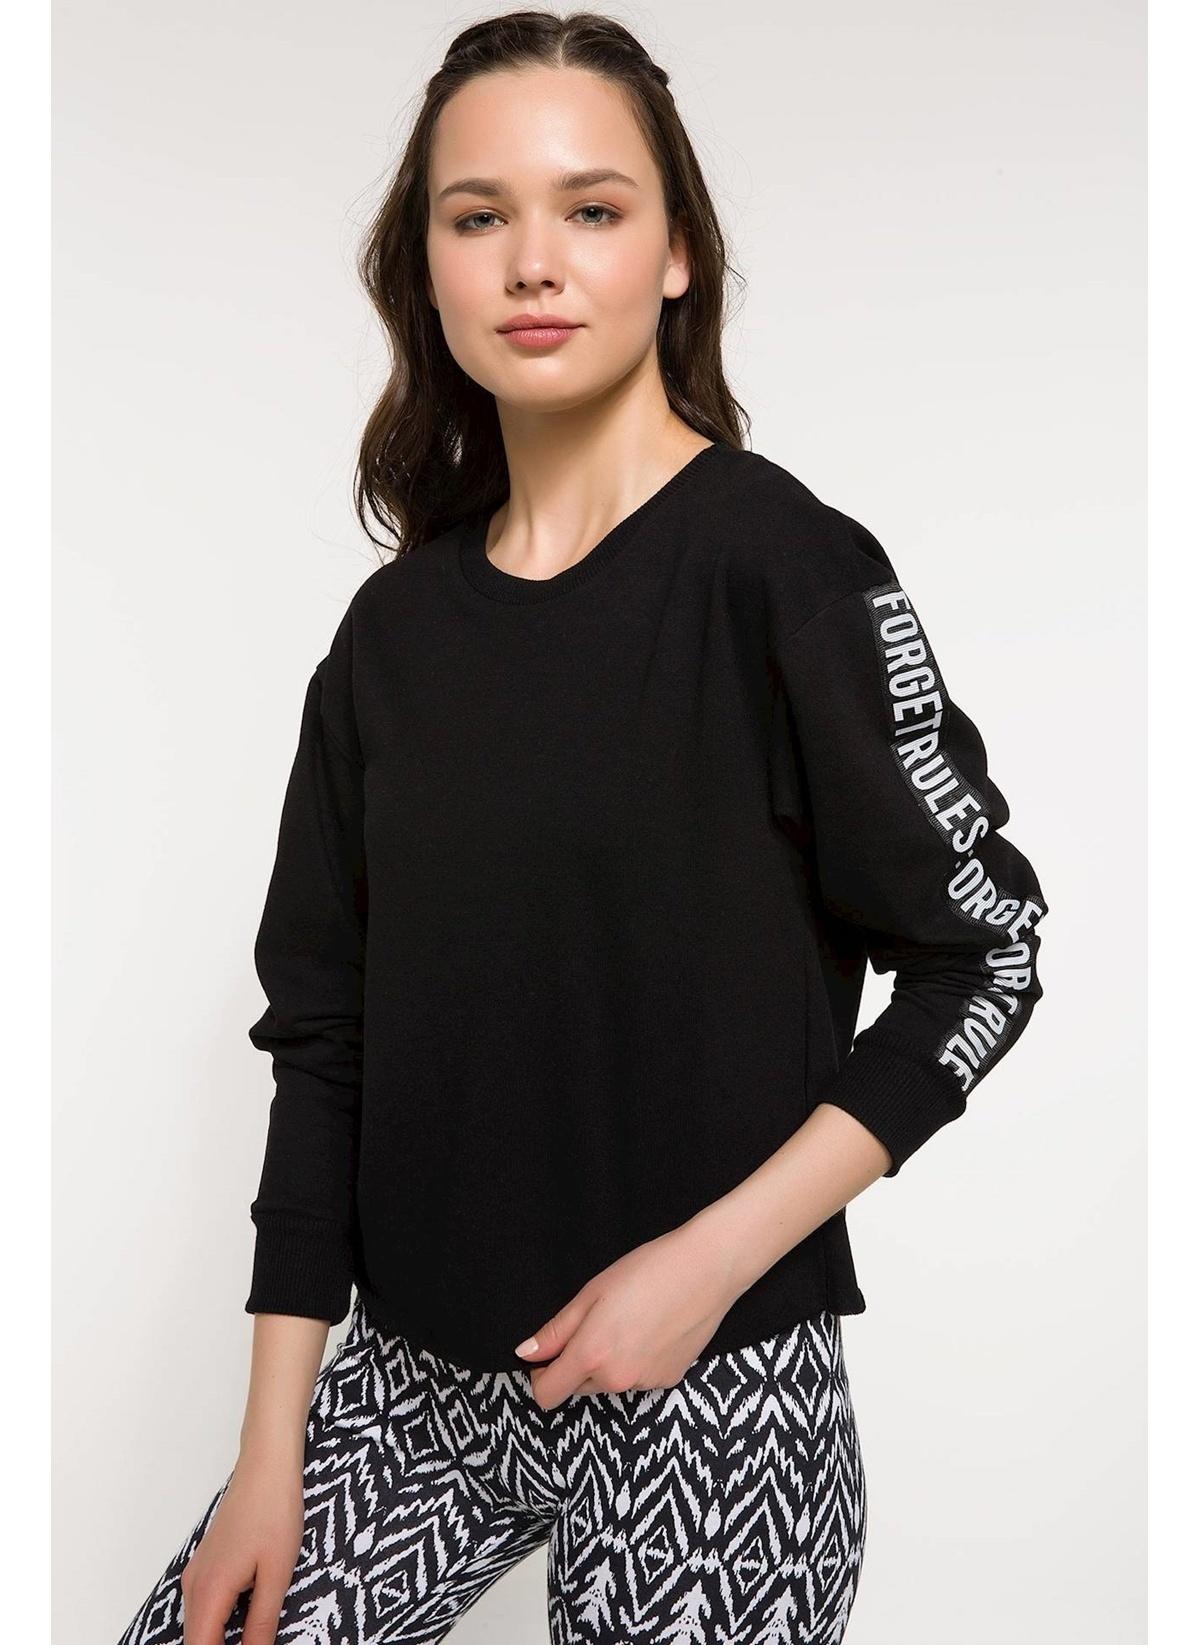 Defacto Kolları Yazı Baskılı Sweatshirt J3664az18smbk46sweatshirt – 34.99 TL